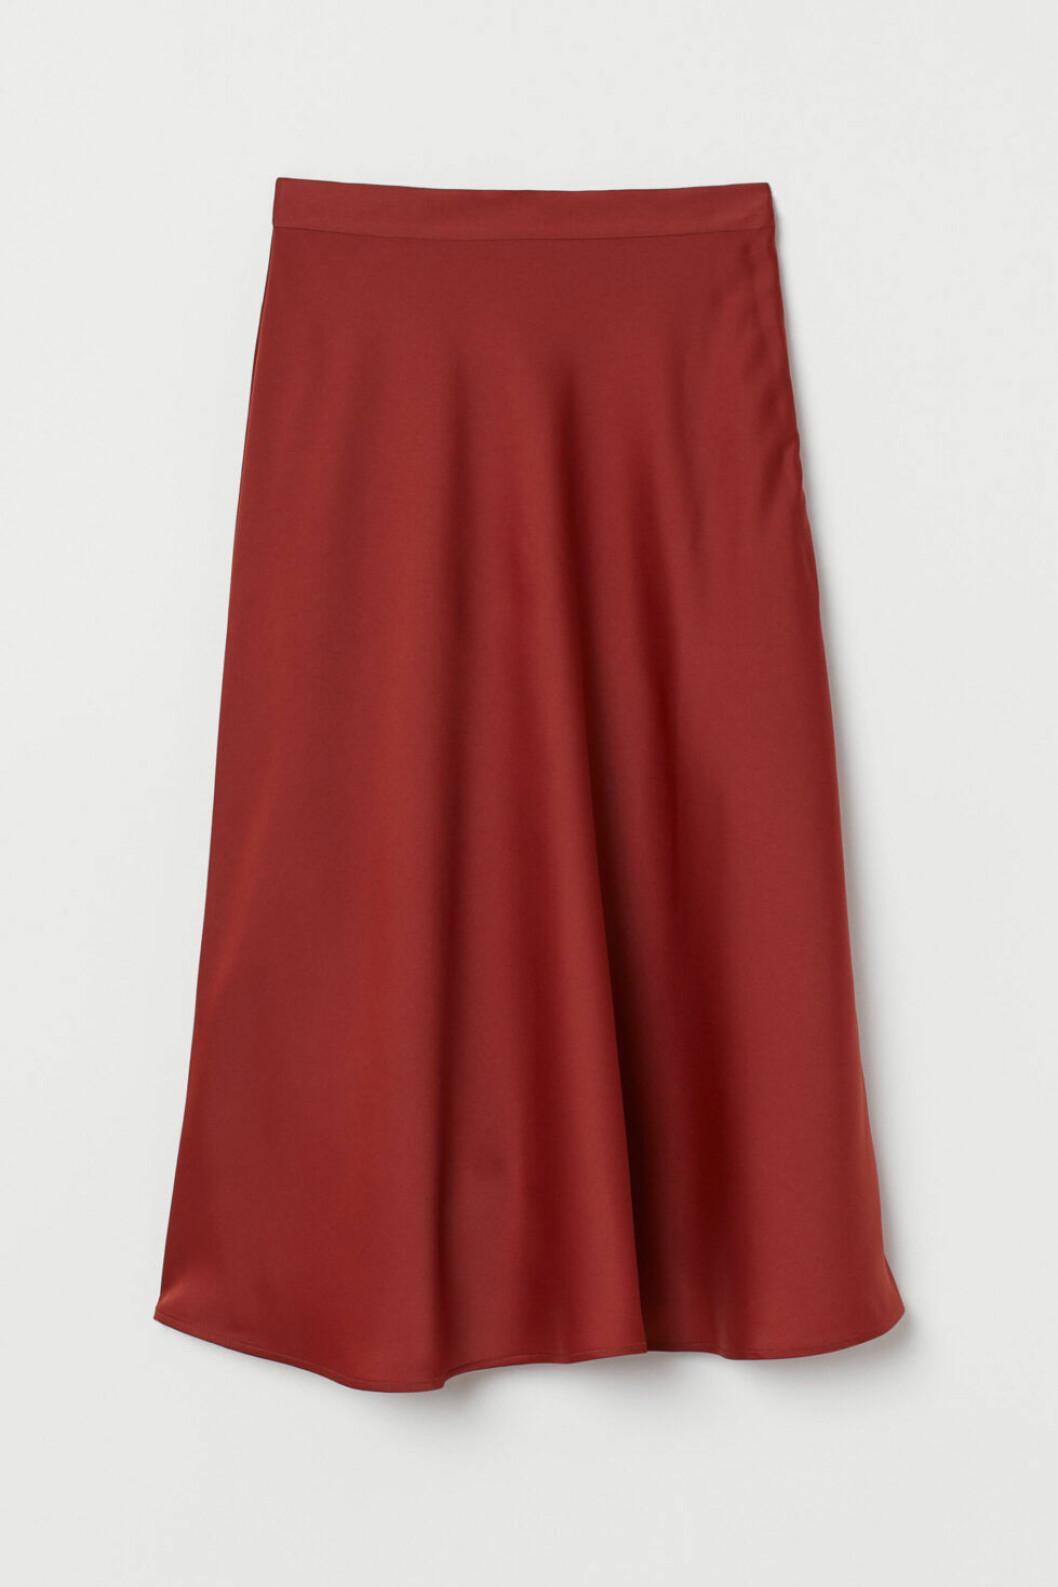 h6M rostrod kjol